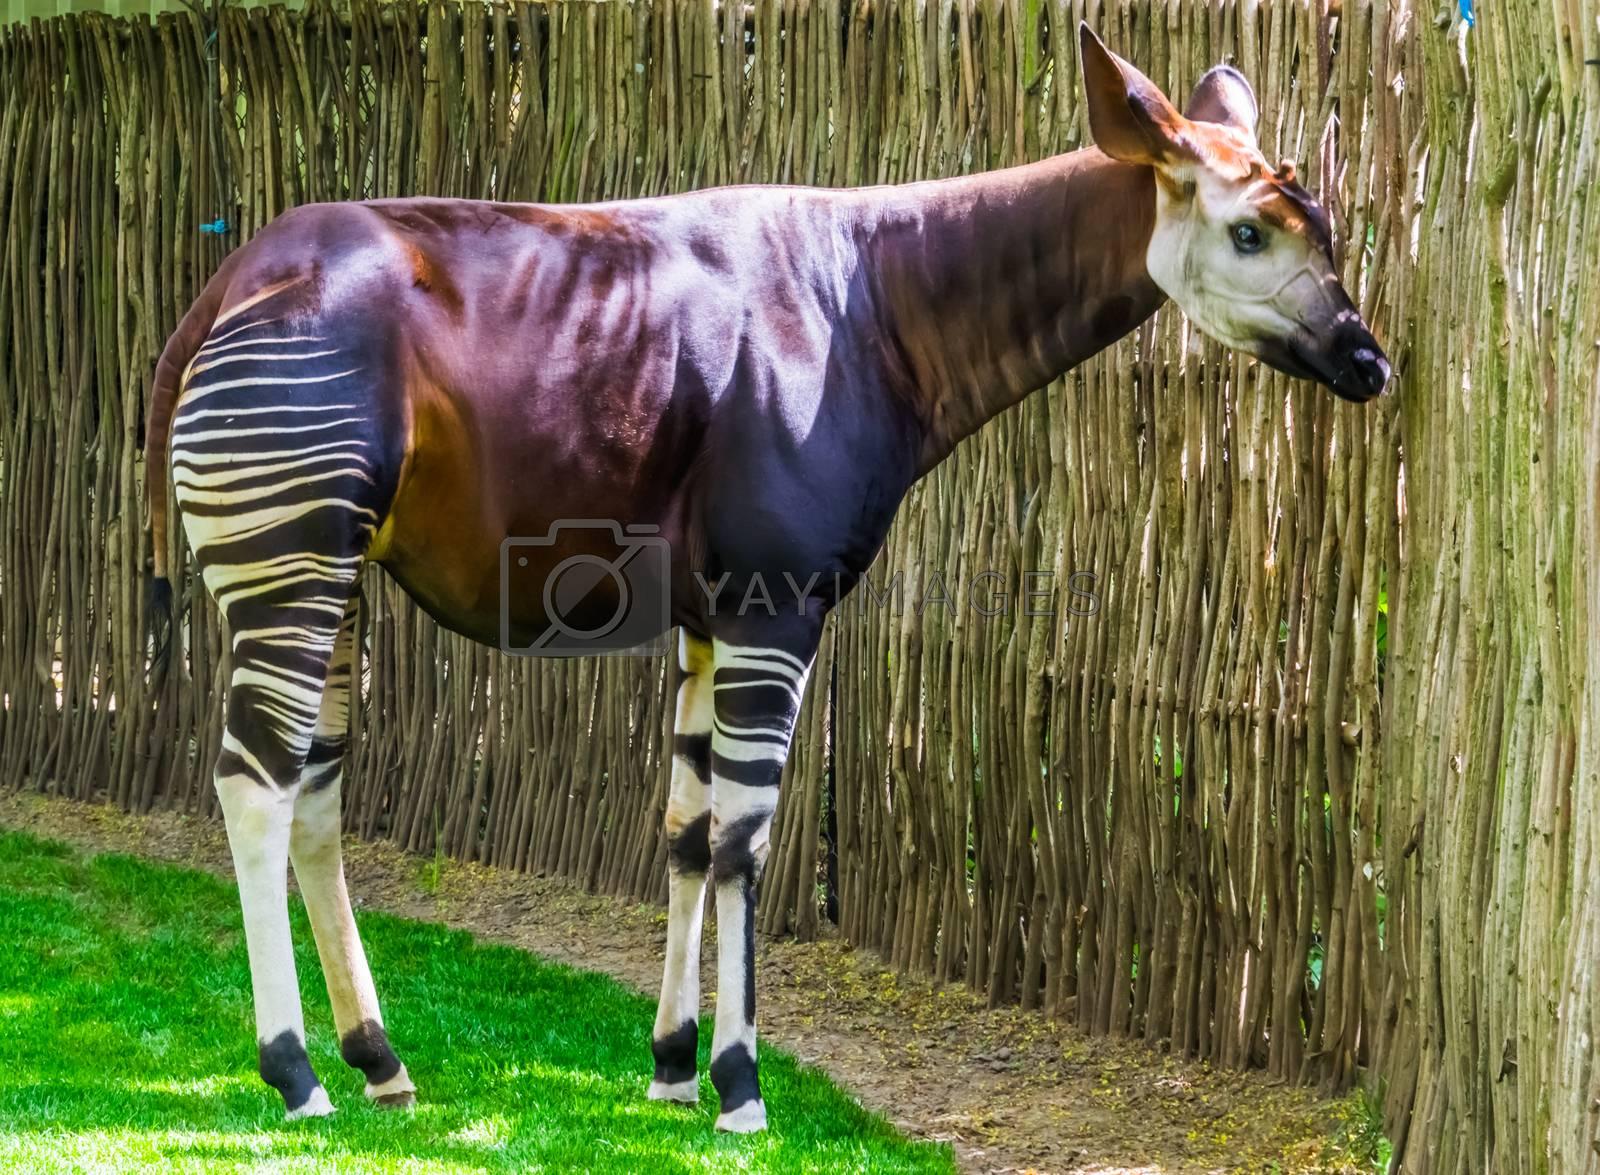 Okapi in closeup, Endangered animal specie, giraffe from Congo, Africa